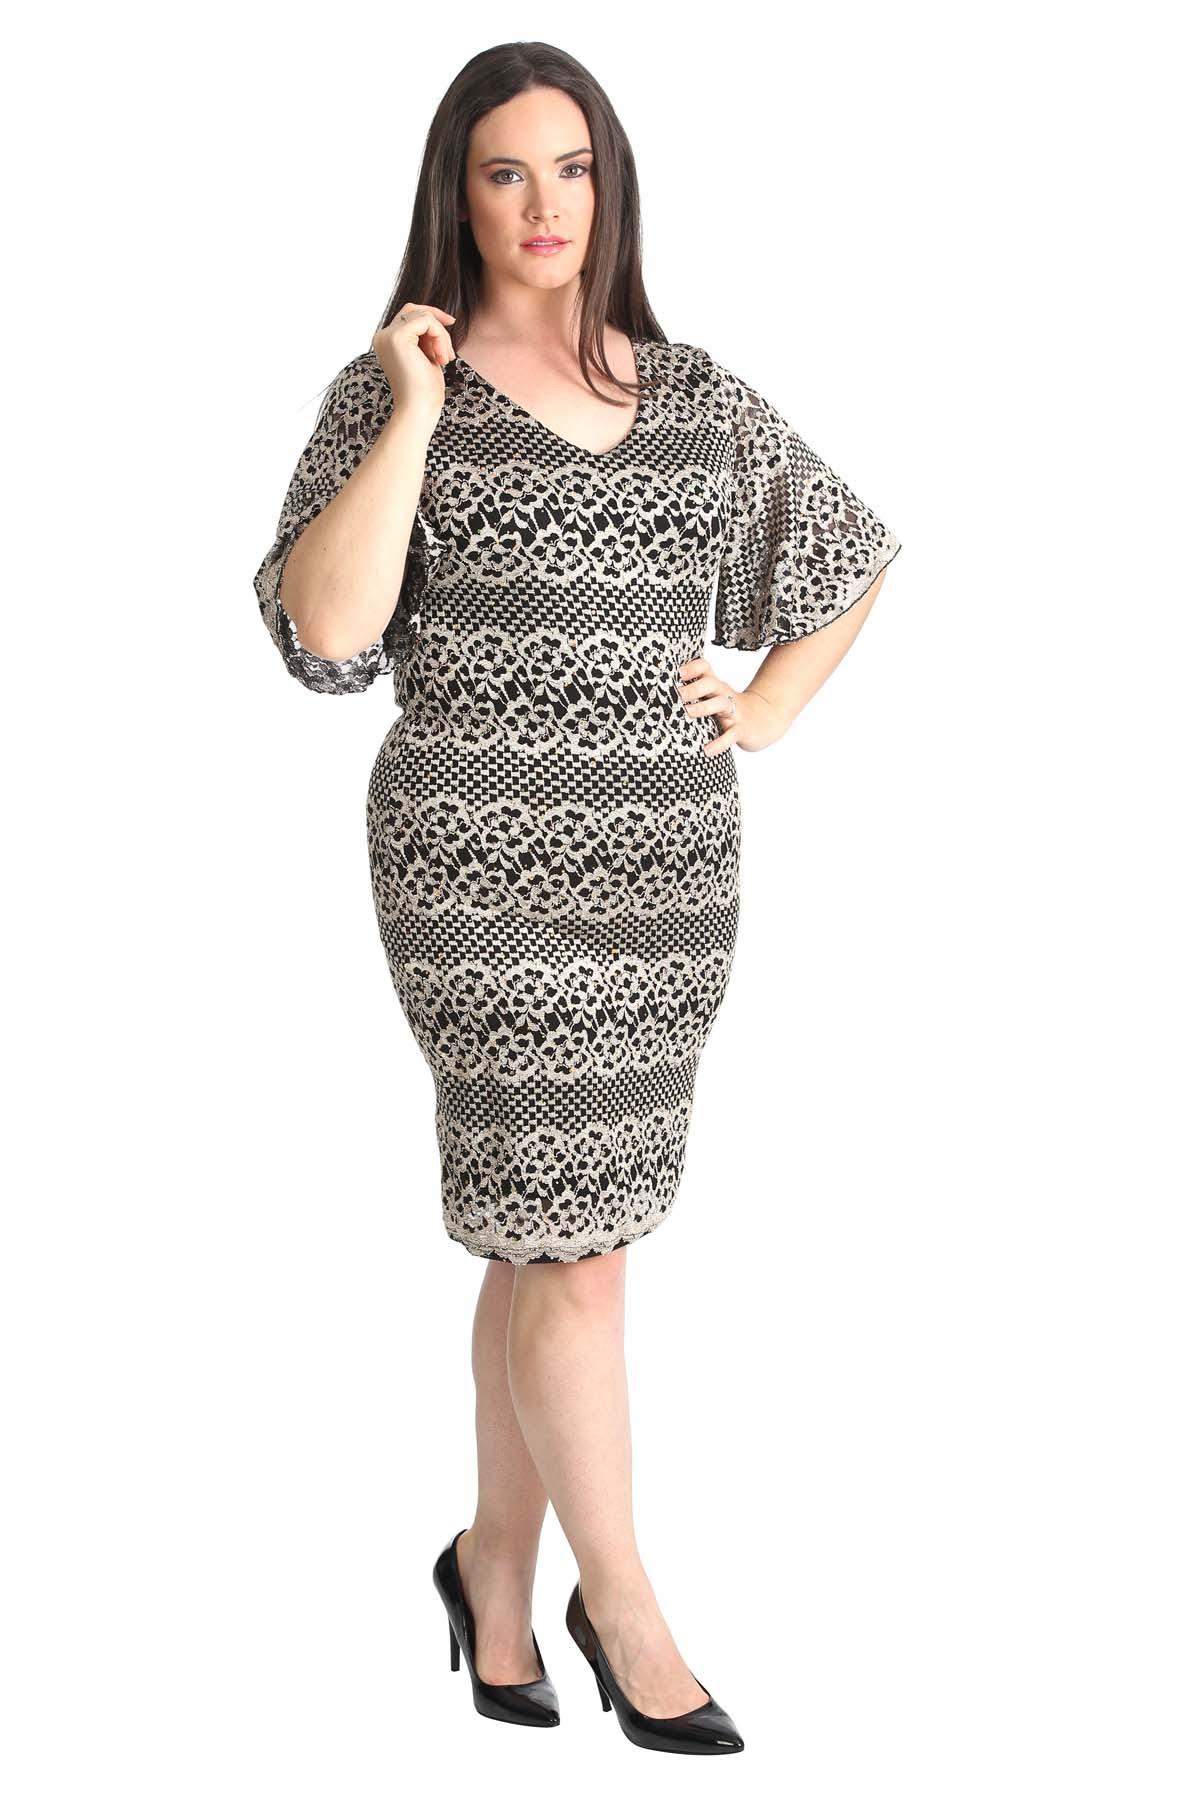 Bodycon midi dress plus size shopping centre